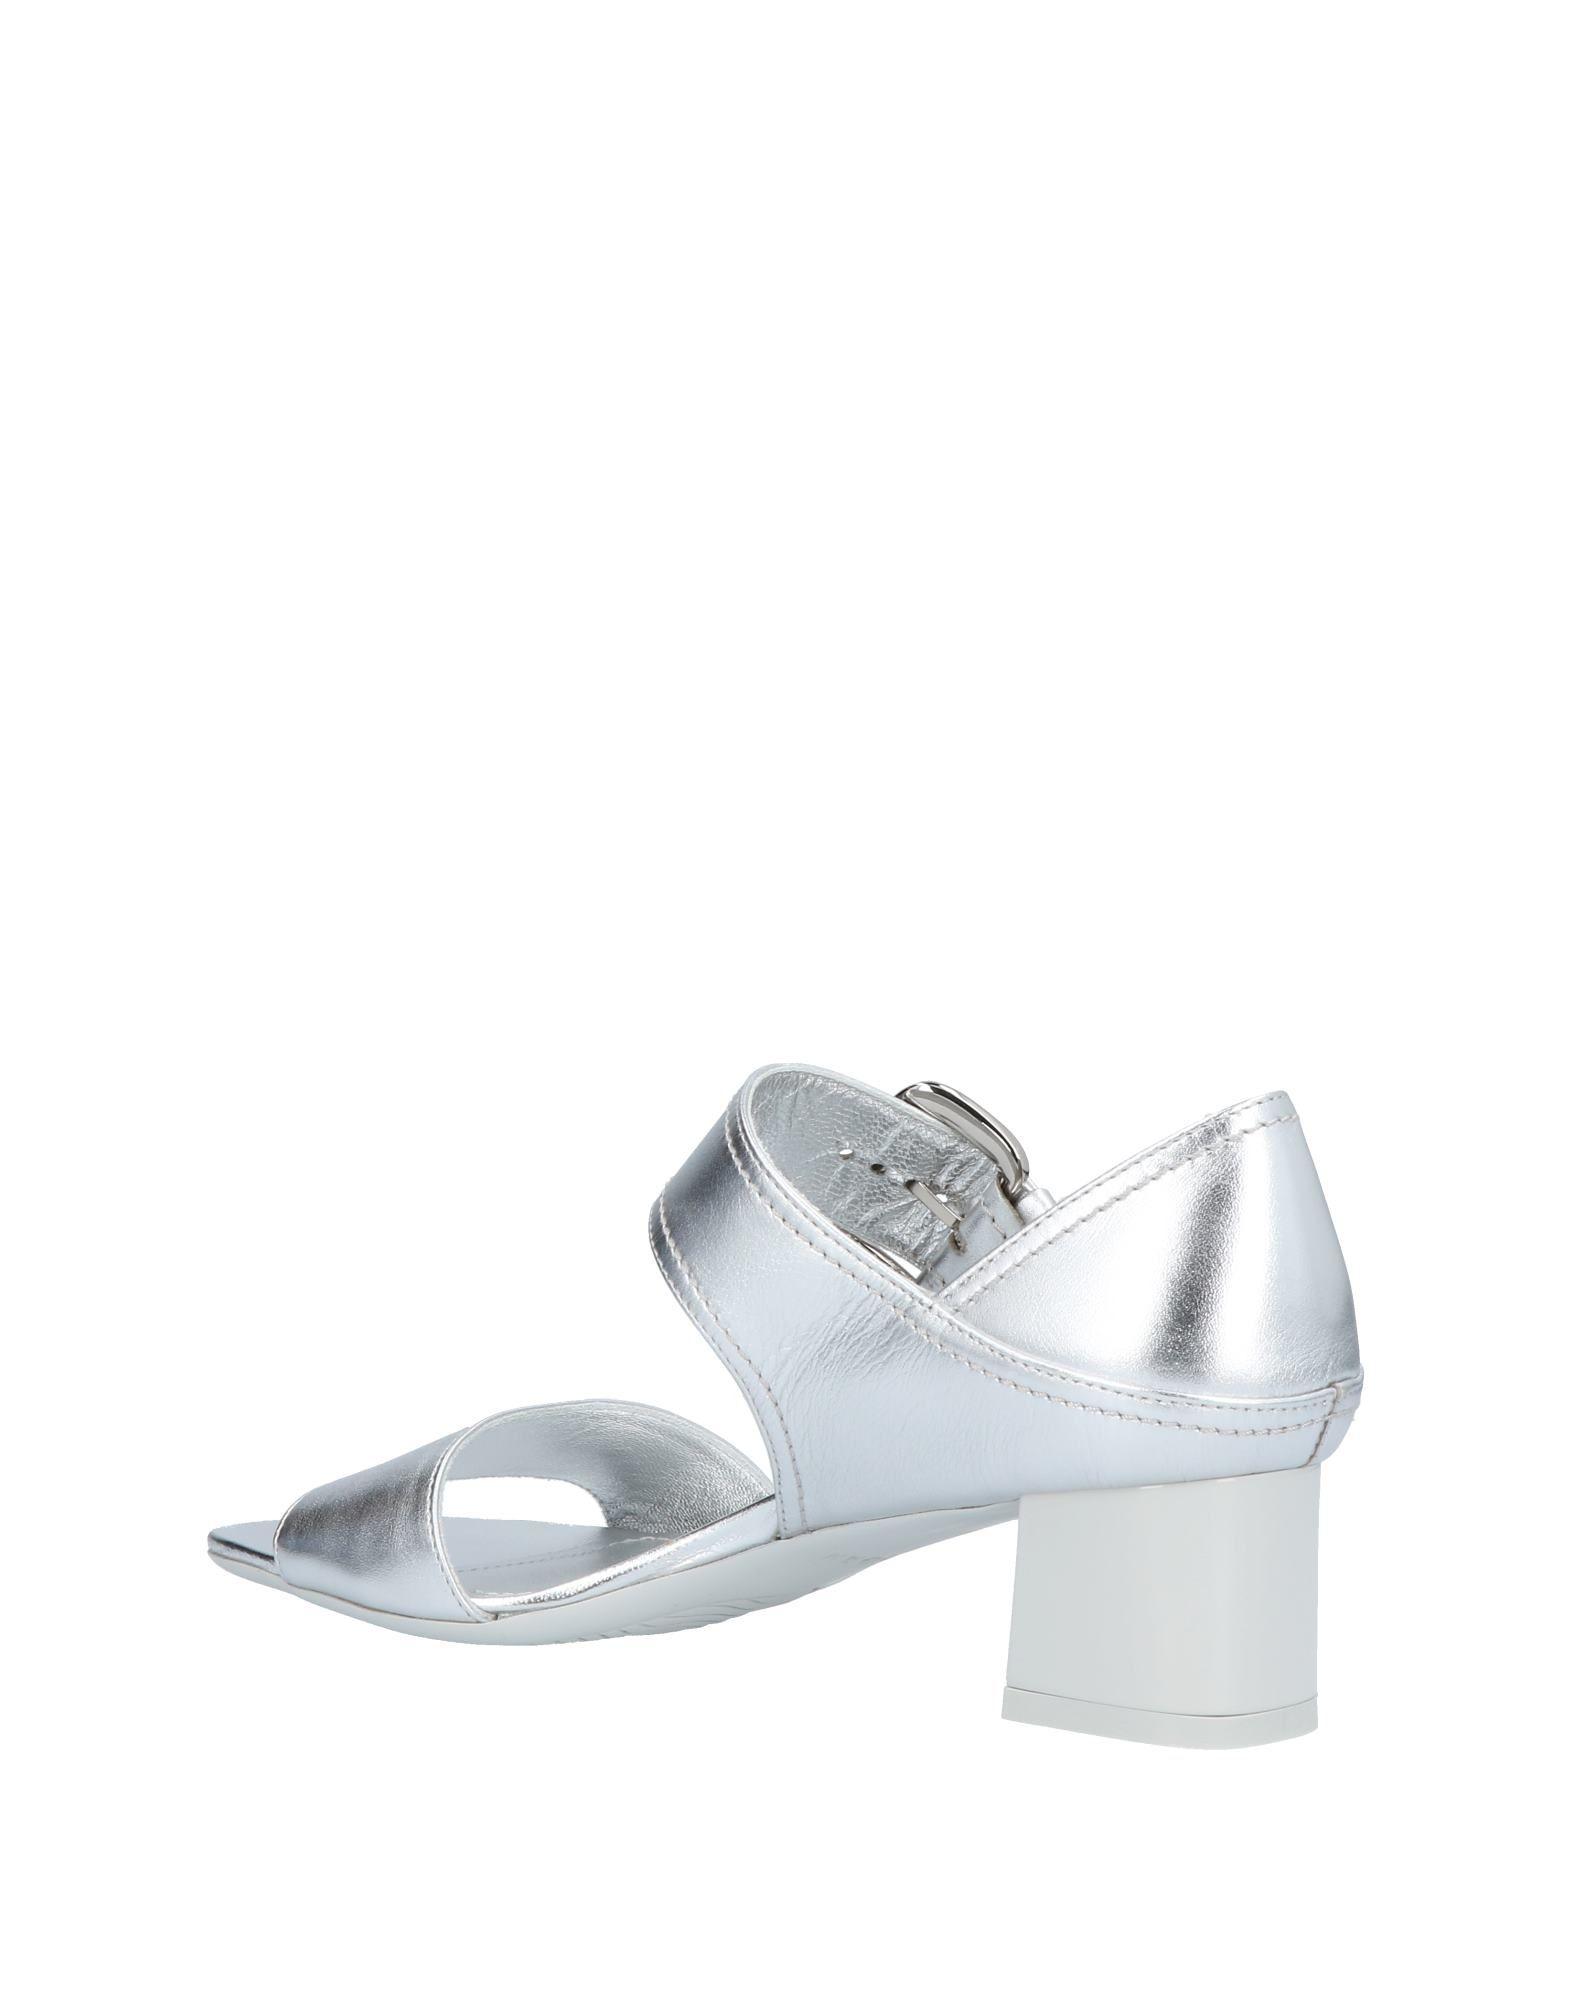 Stilvolle billige Schuhe Hogan Sandalen Damen  11396038BR 11396038BR 11396038BR cae52a